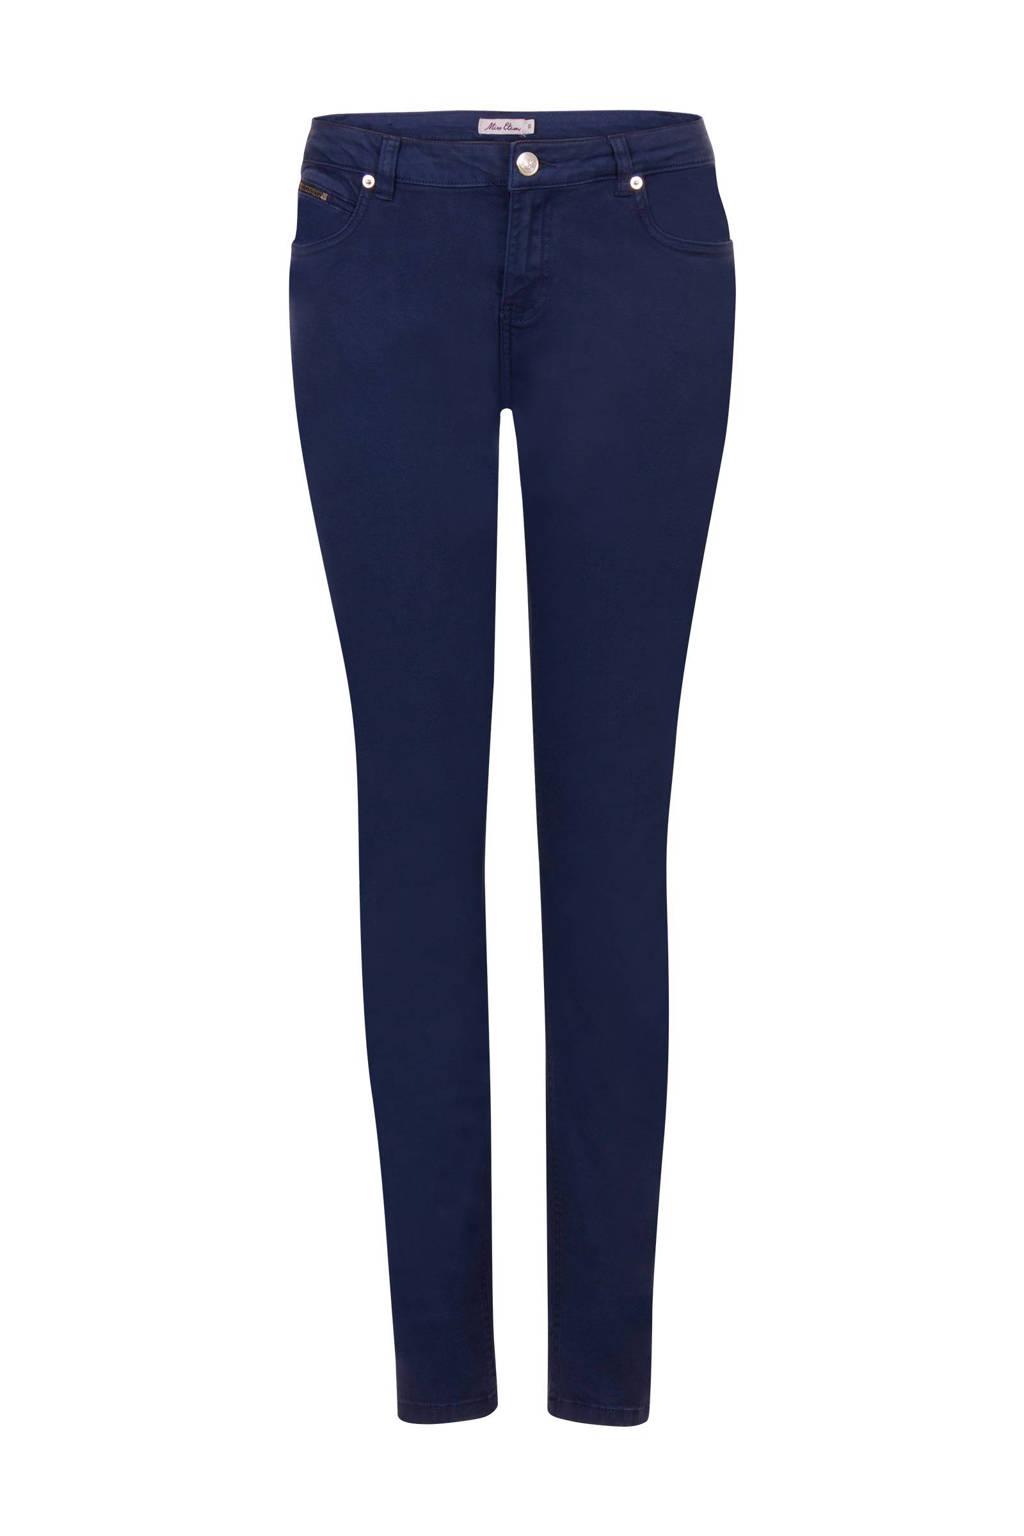 Miss Etam Regulier slim fit broek 32 inch, Blauw